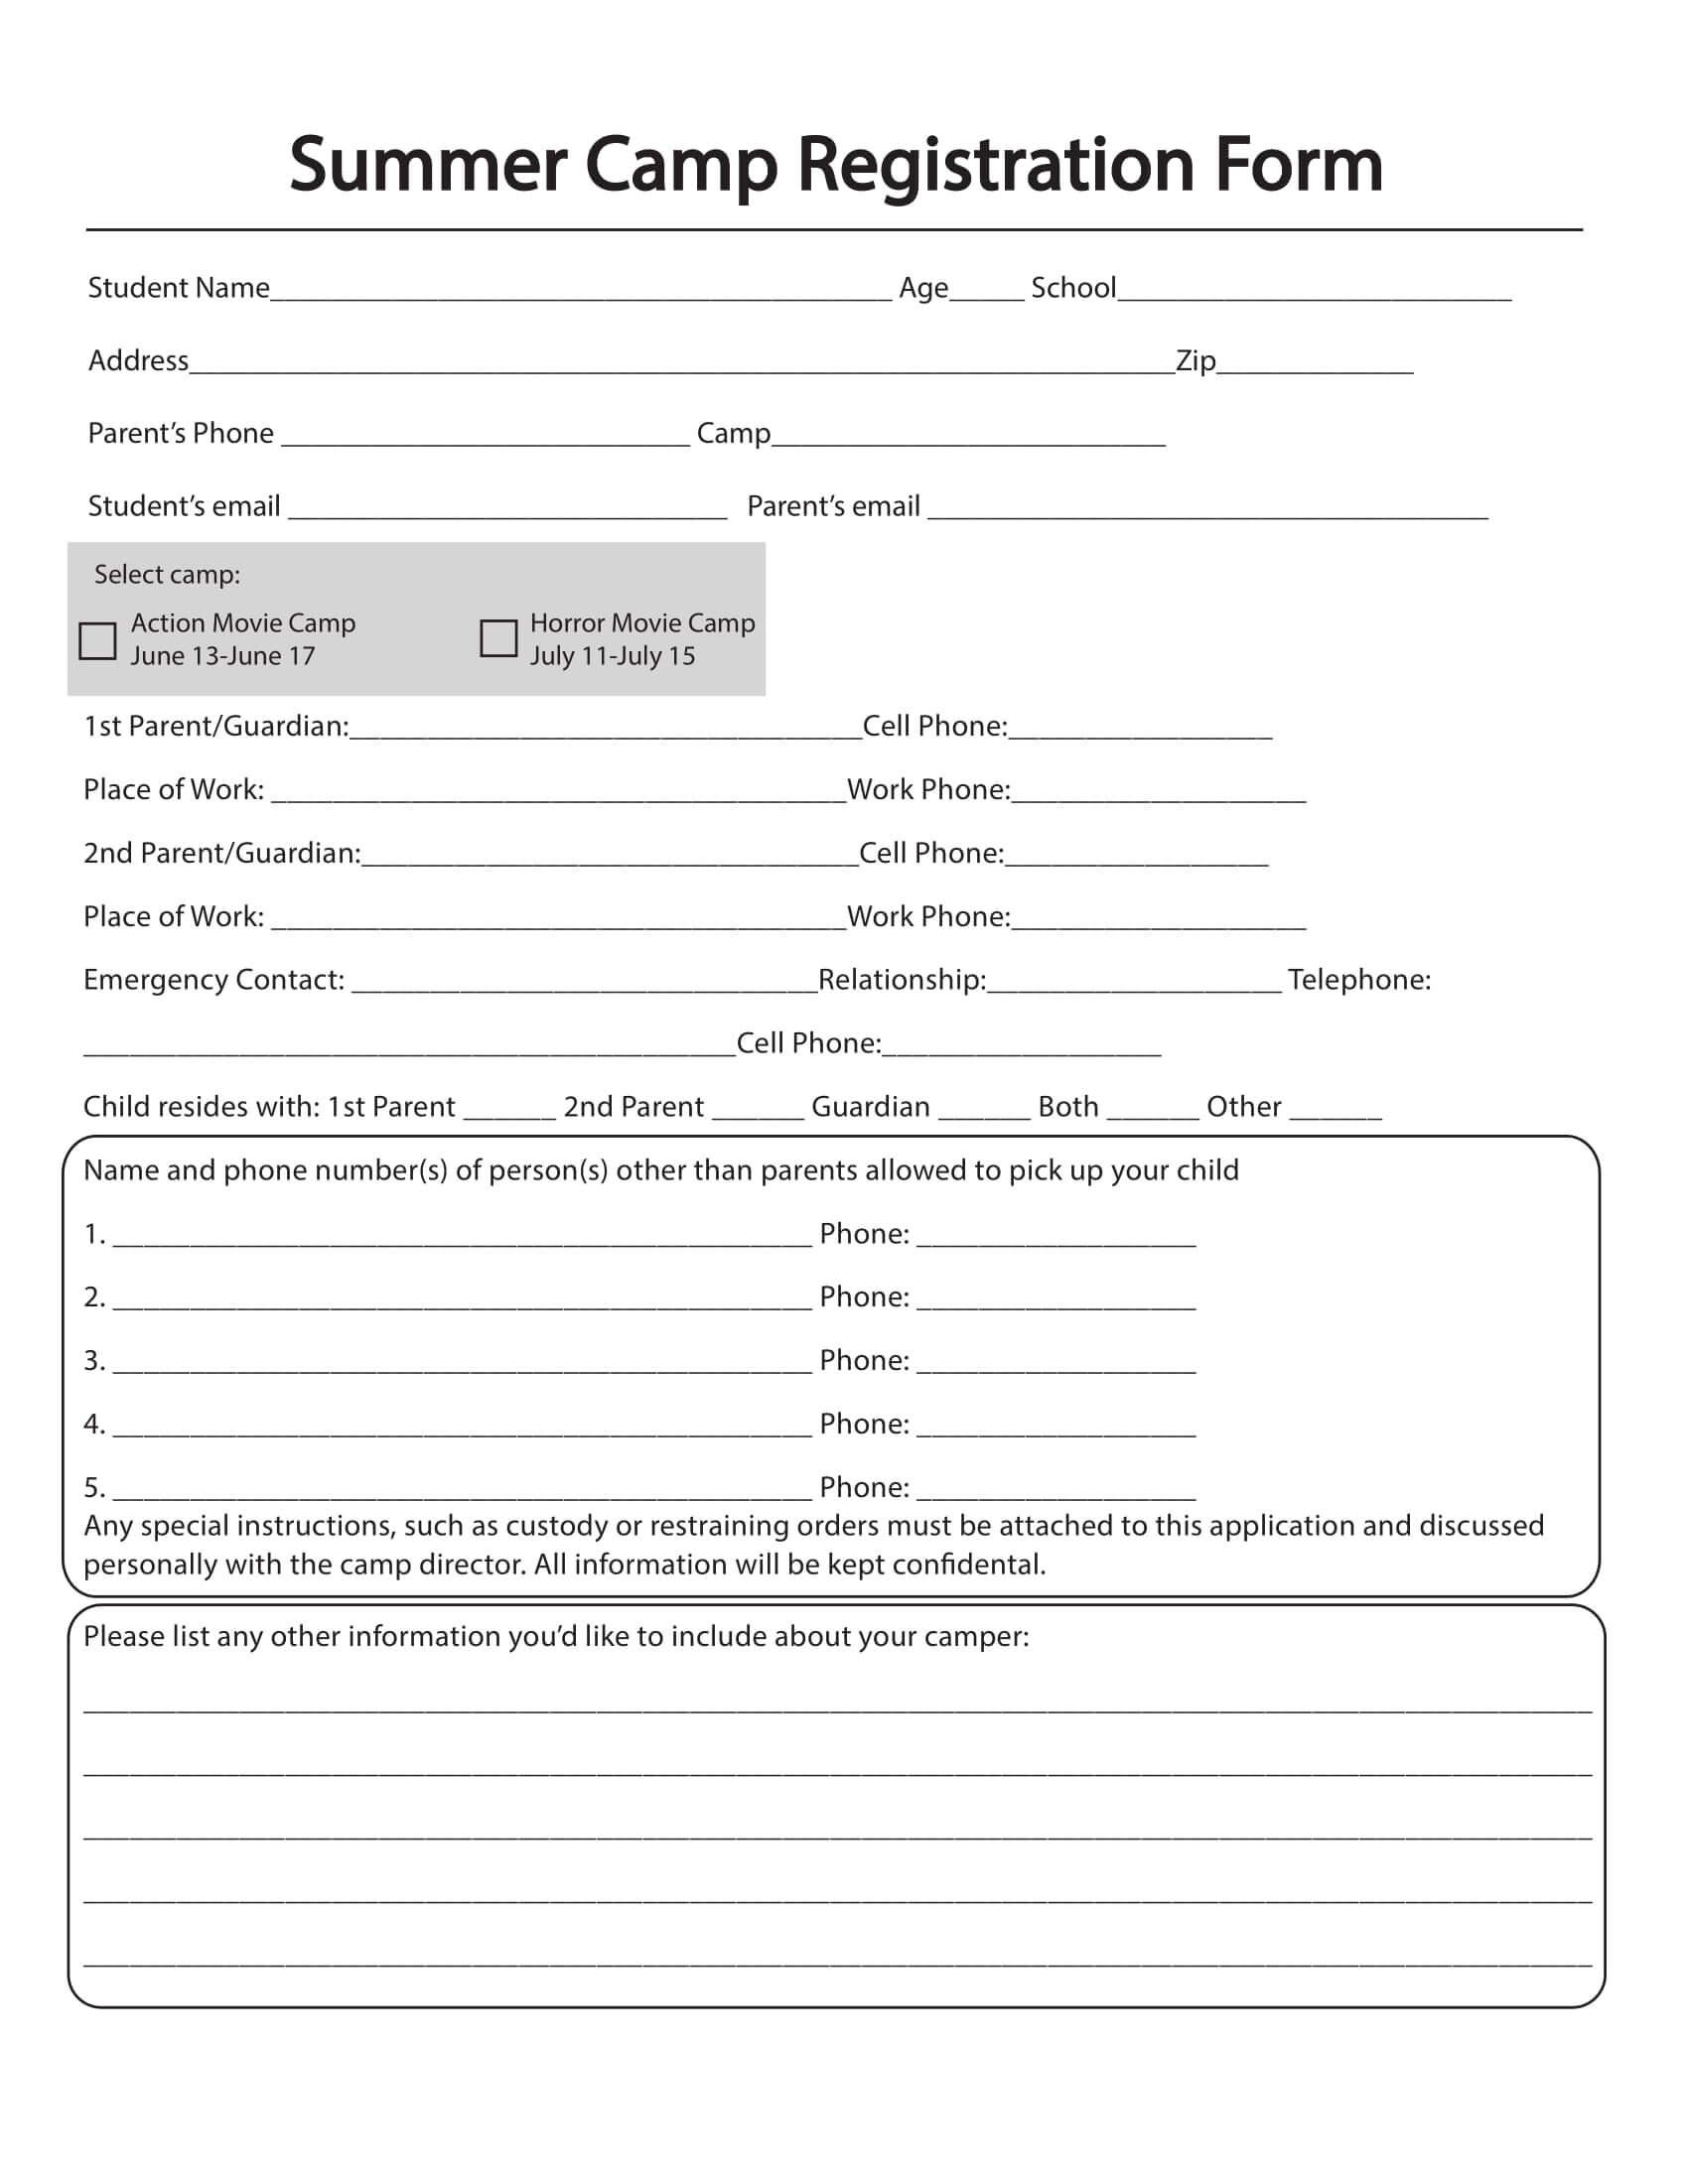 Free 10+ Printable Summer Camp Registration Forms | Pdf Throughout Camp Registration Form Template Word